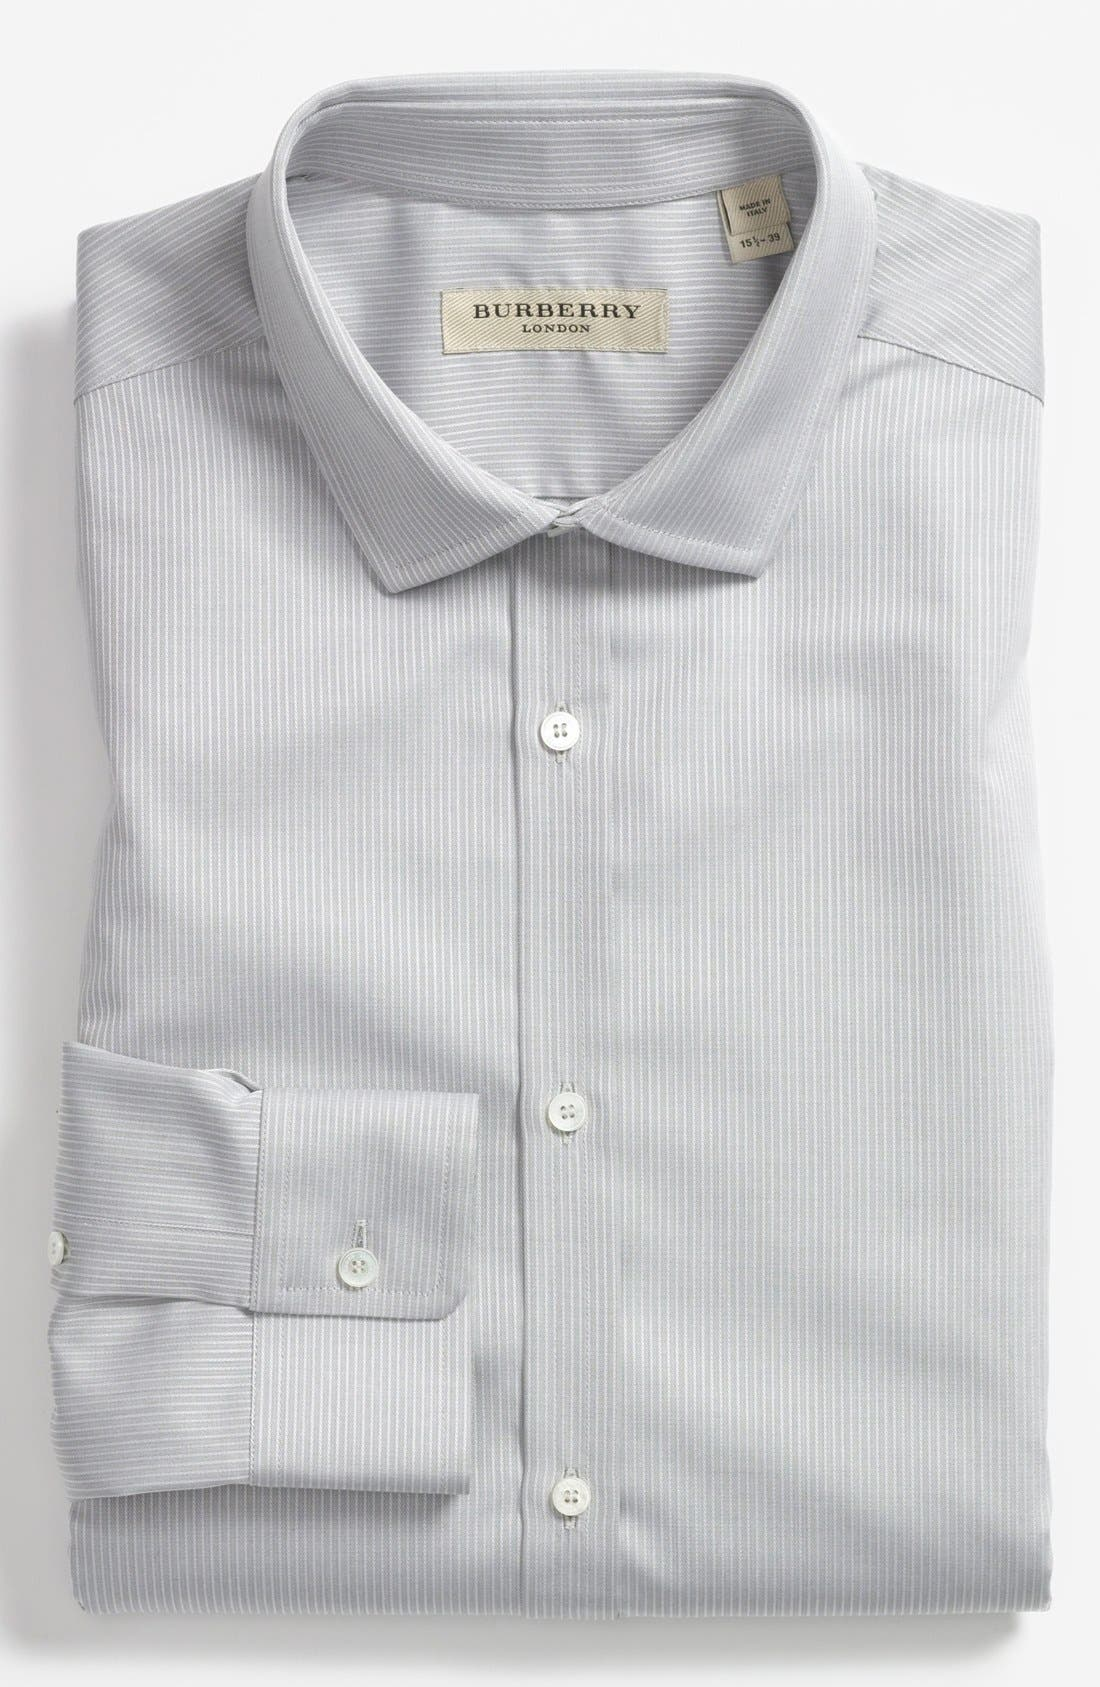 Alternate Image 1 Selected - Burberry London Stripe Tailored Fit Dress Shirt